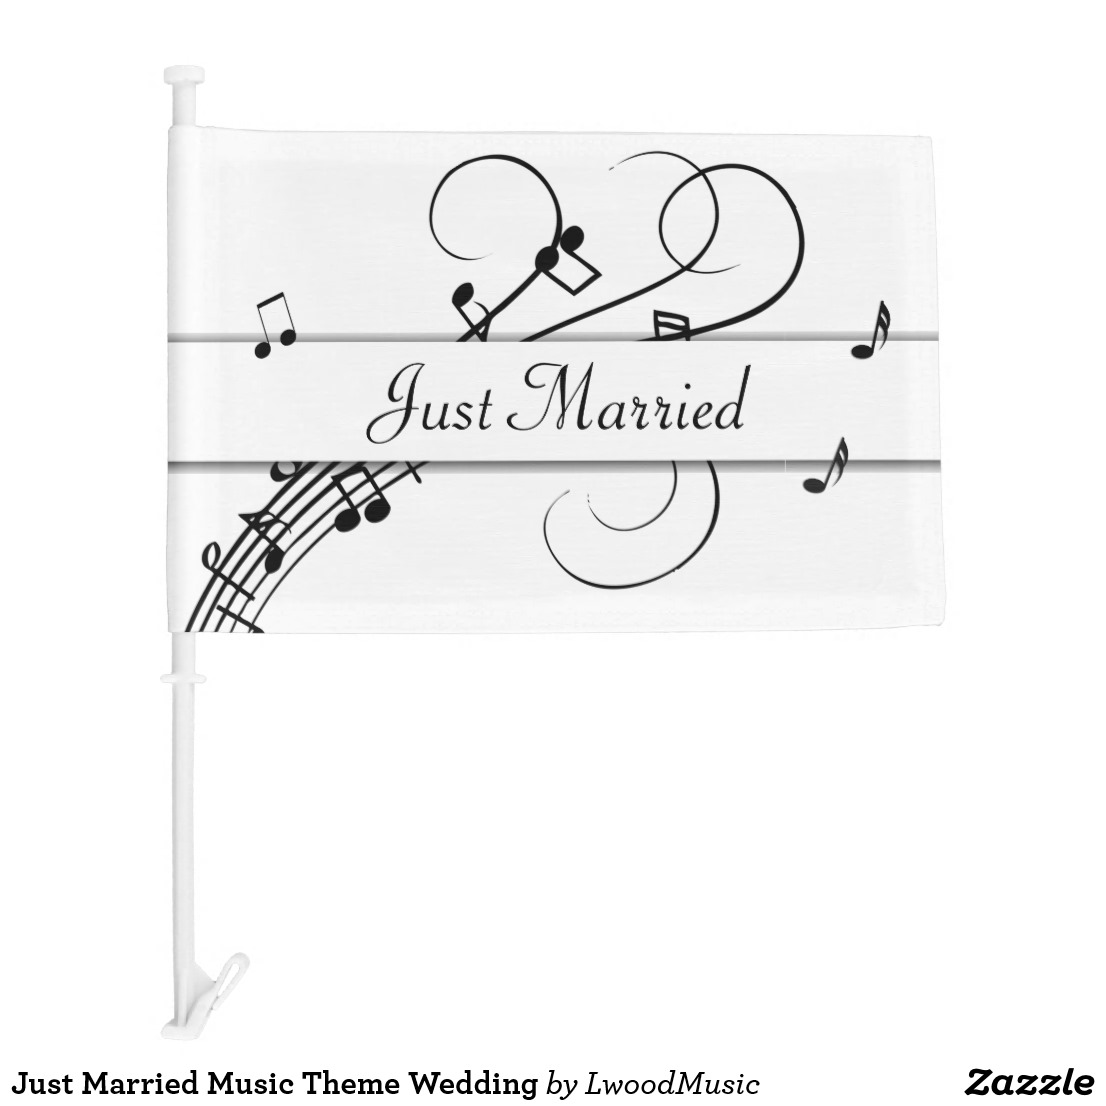 Just Married Music Theme Wedding Car Flag